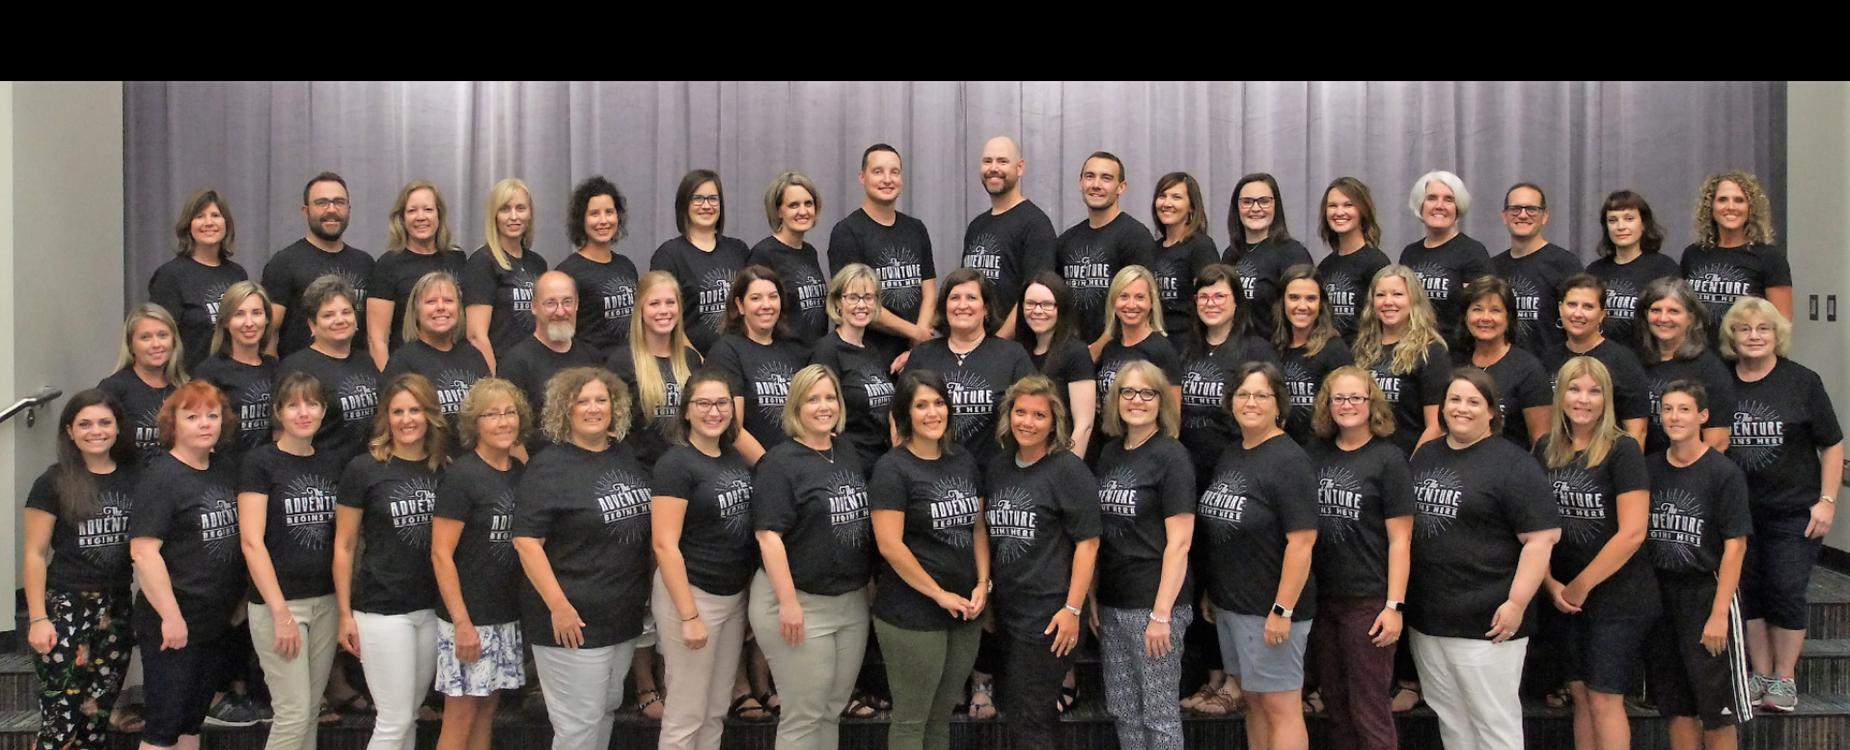 Heavilin Elementary Staff Photo 2018-2019